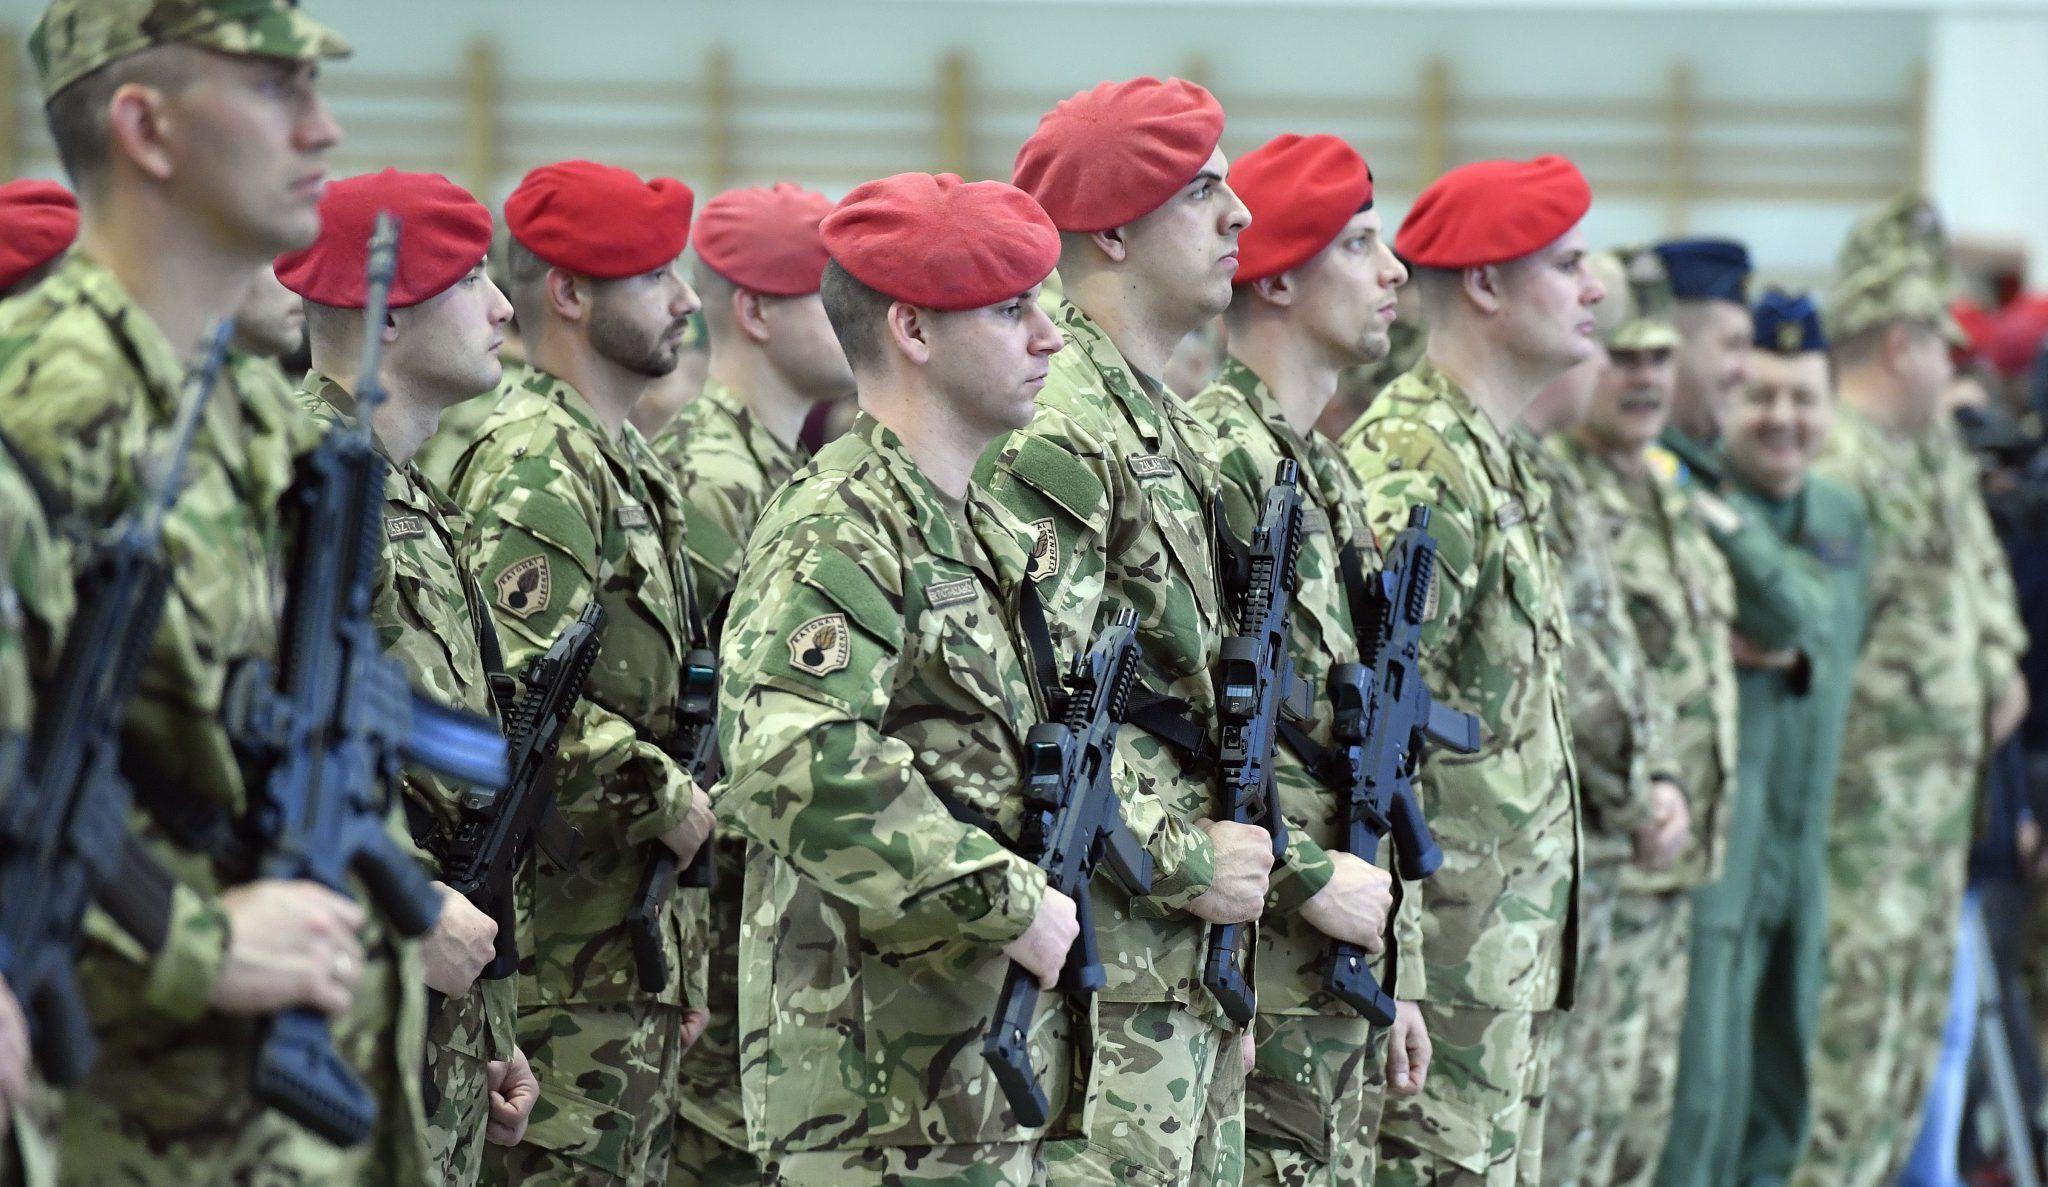 Hungarian military